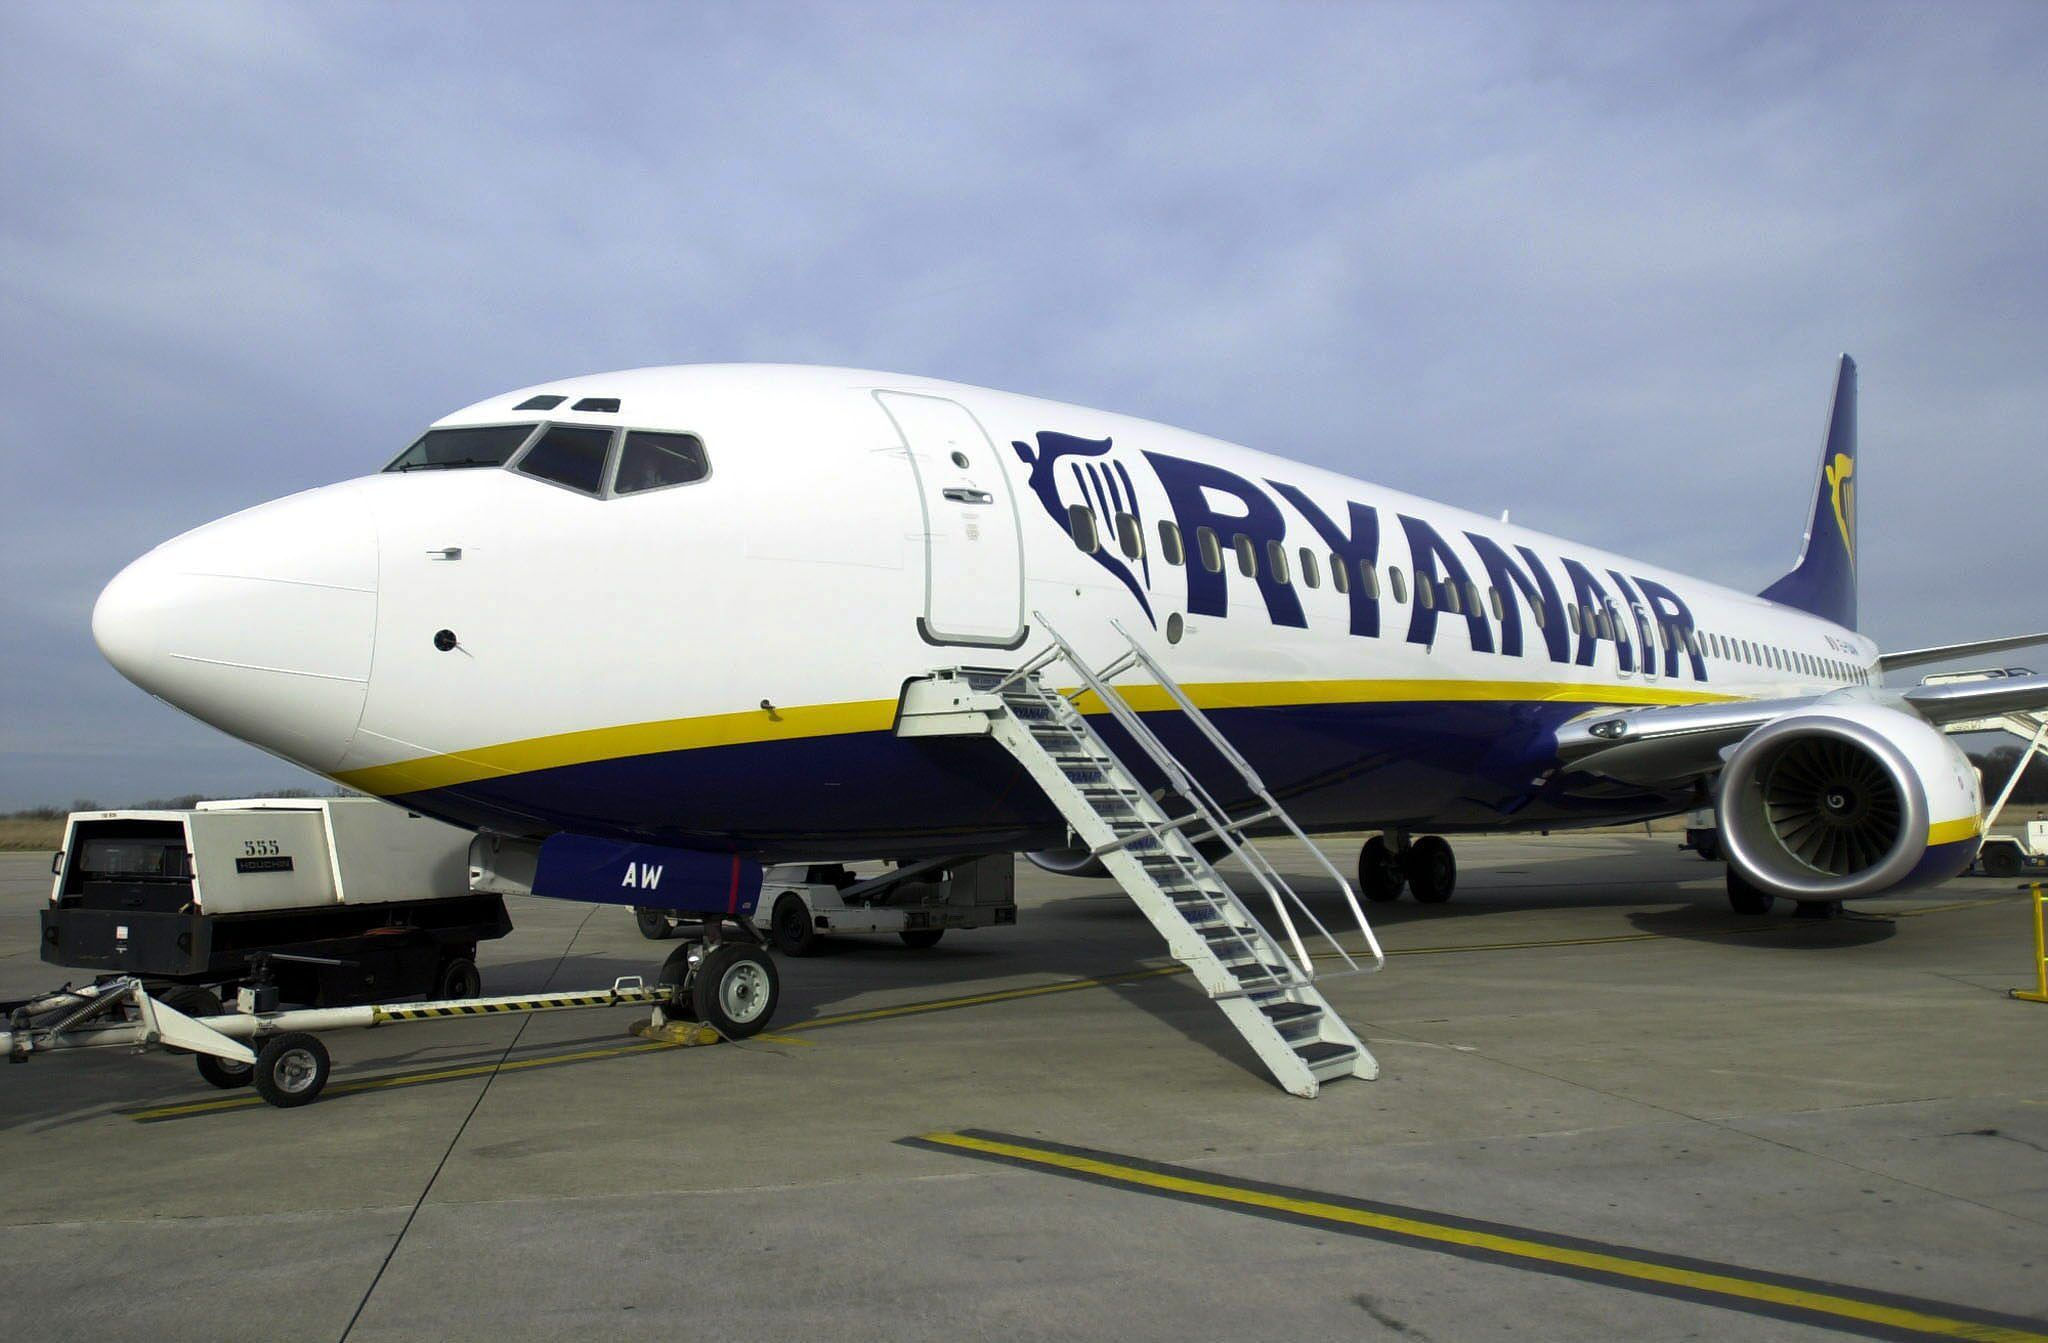 Nuove regole sui bagagli a mano Ryanair